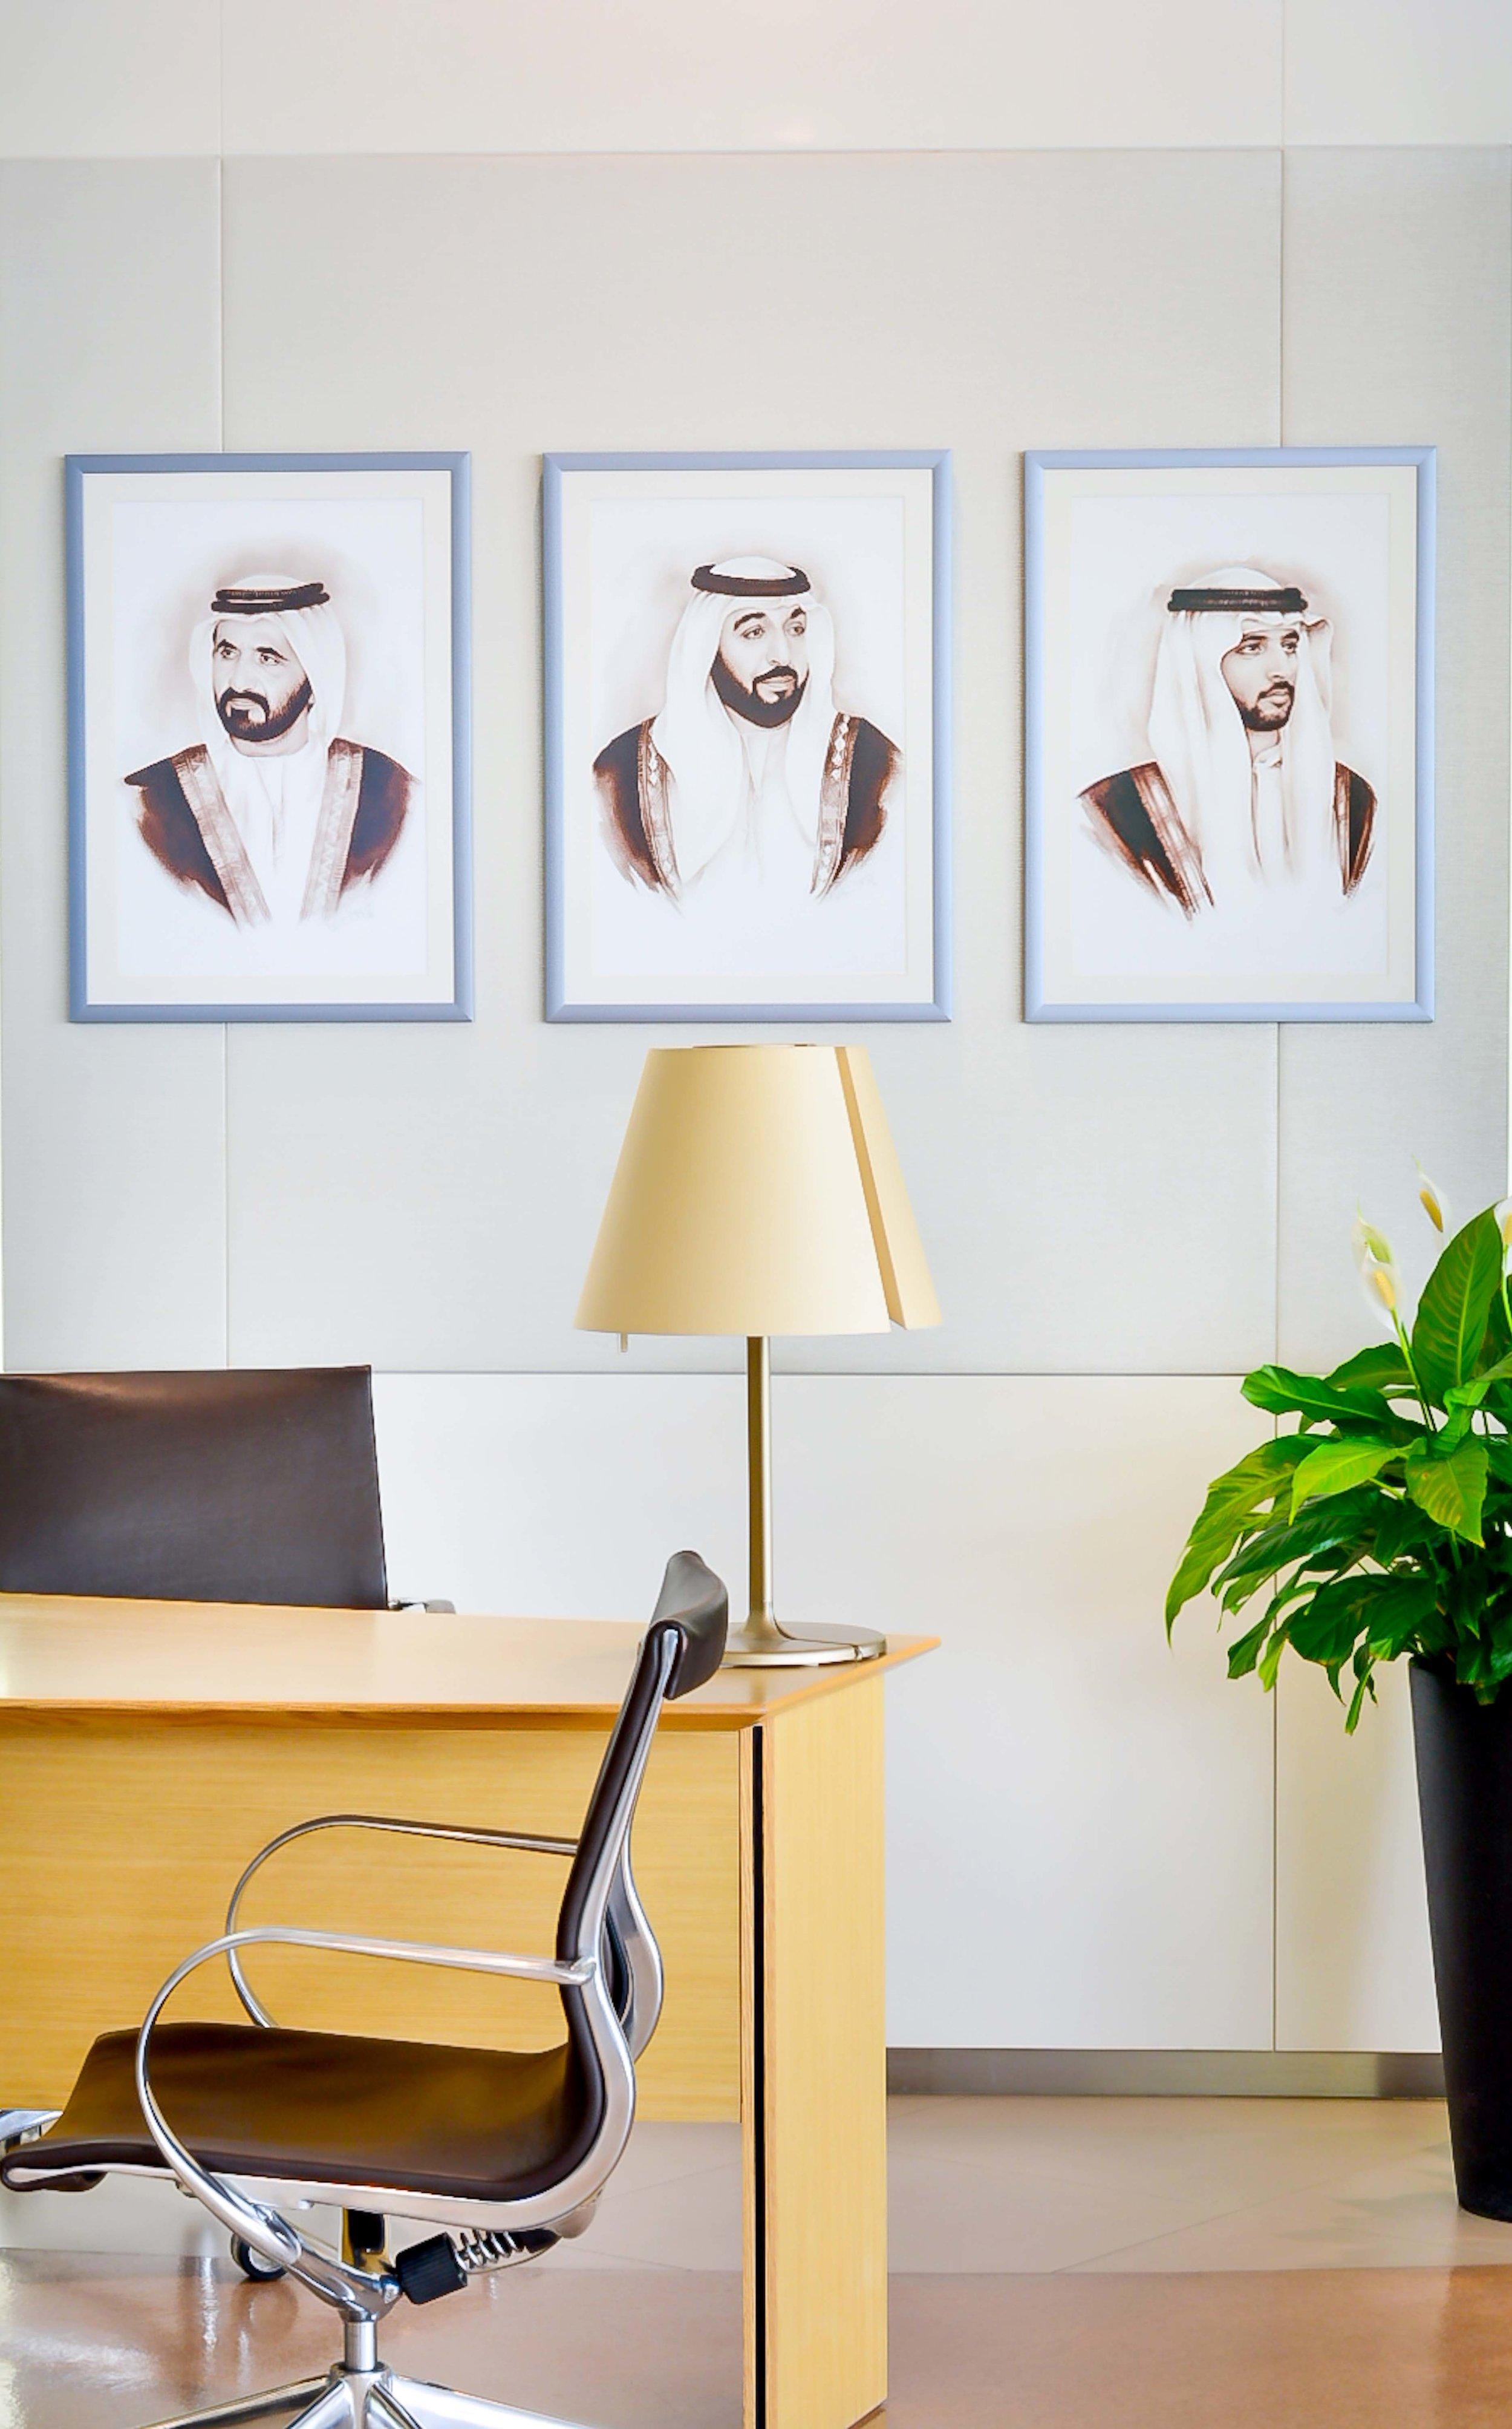 capsule-arts-products-sheikh-portraits.jpg